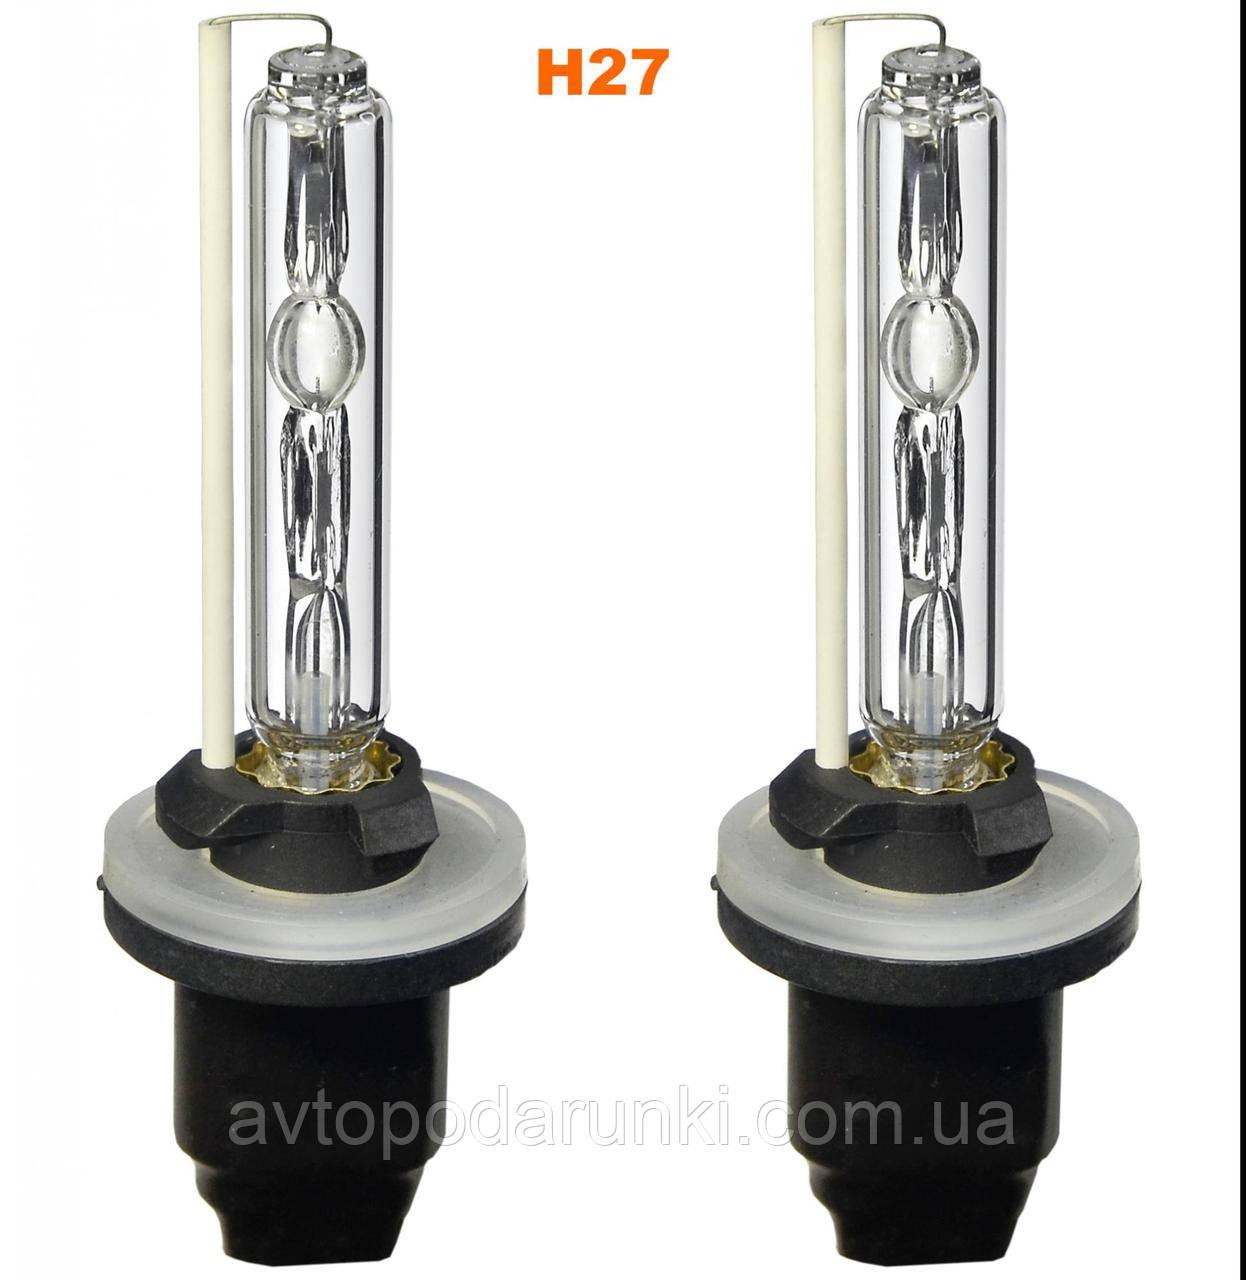 Ксеноновая лампа PREMIUM, лампа ксенон H27 5000K  ( 35w, 12мес. гарантия ) / 2шт